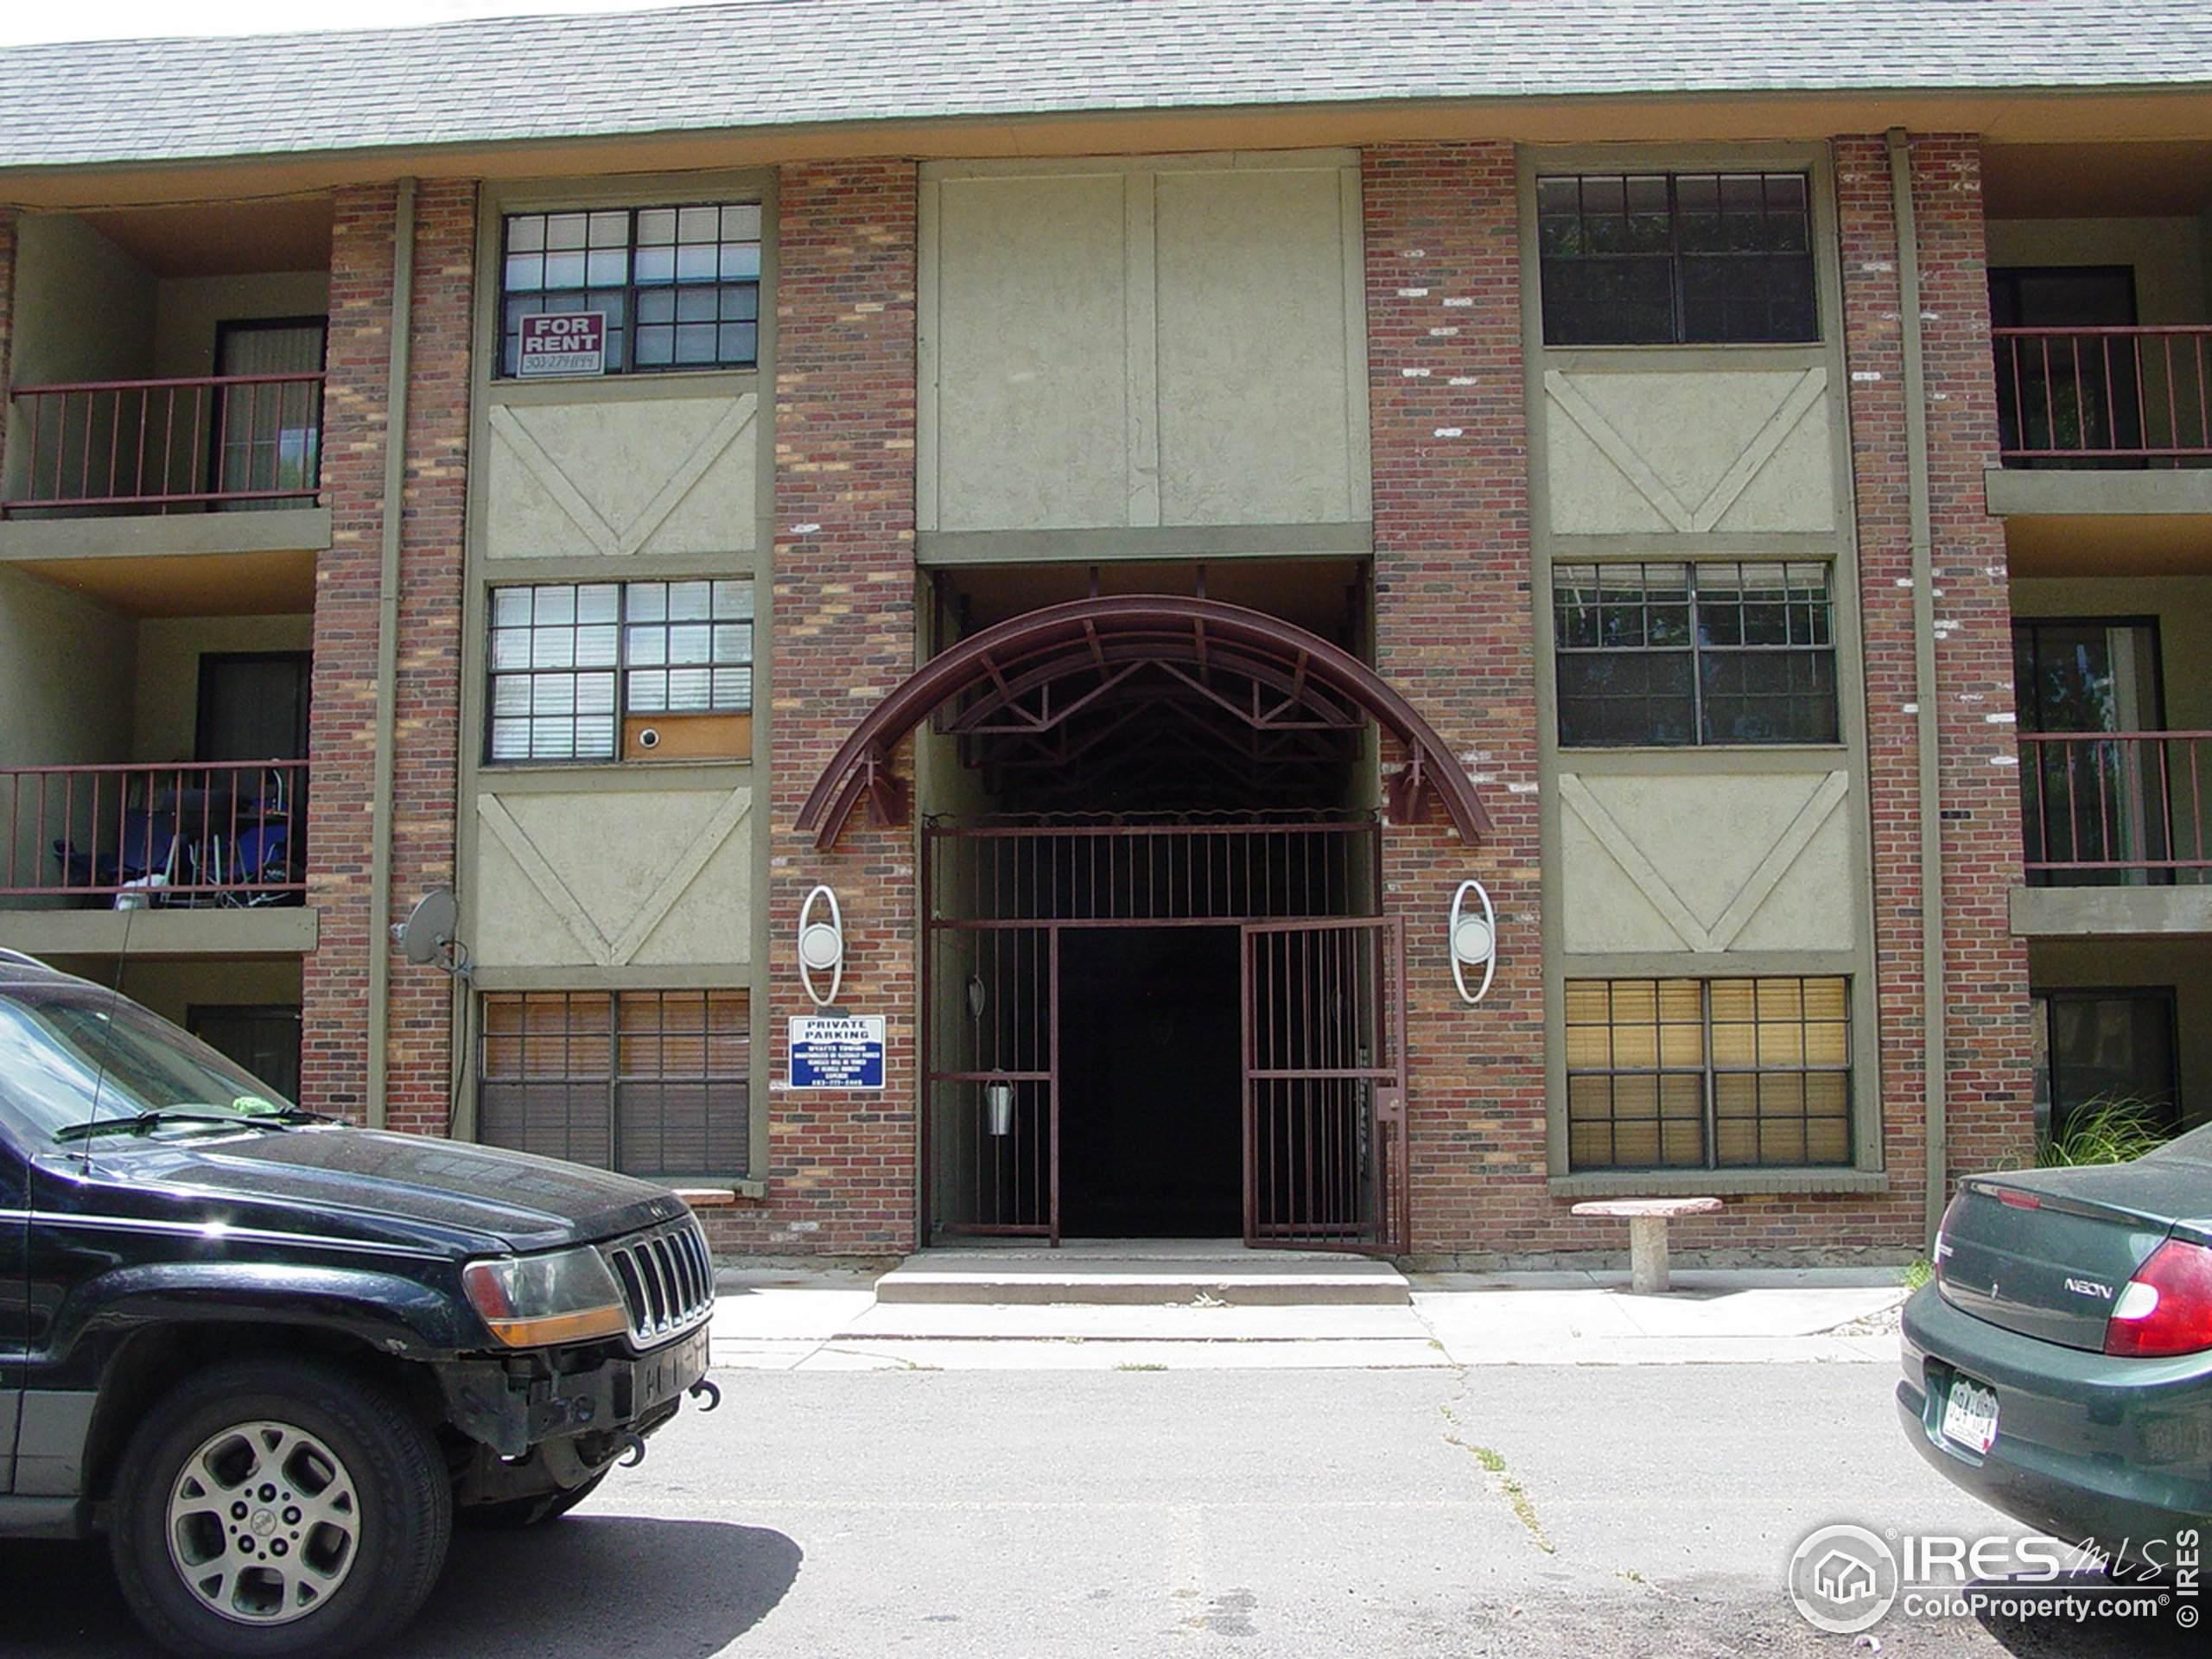 342 E 48th St, Loveland, CO 80538 (MLS #927309) :: Wheelhouse Realty